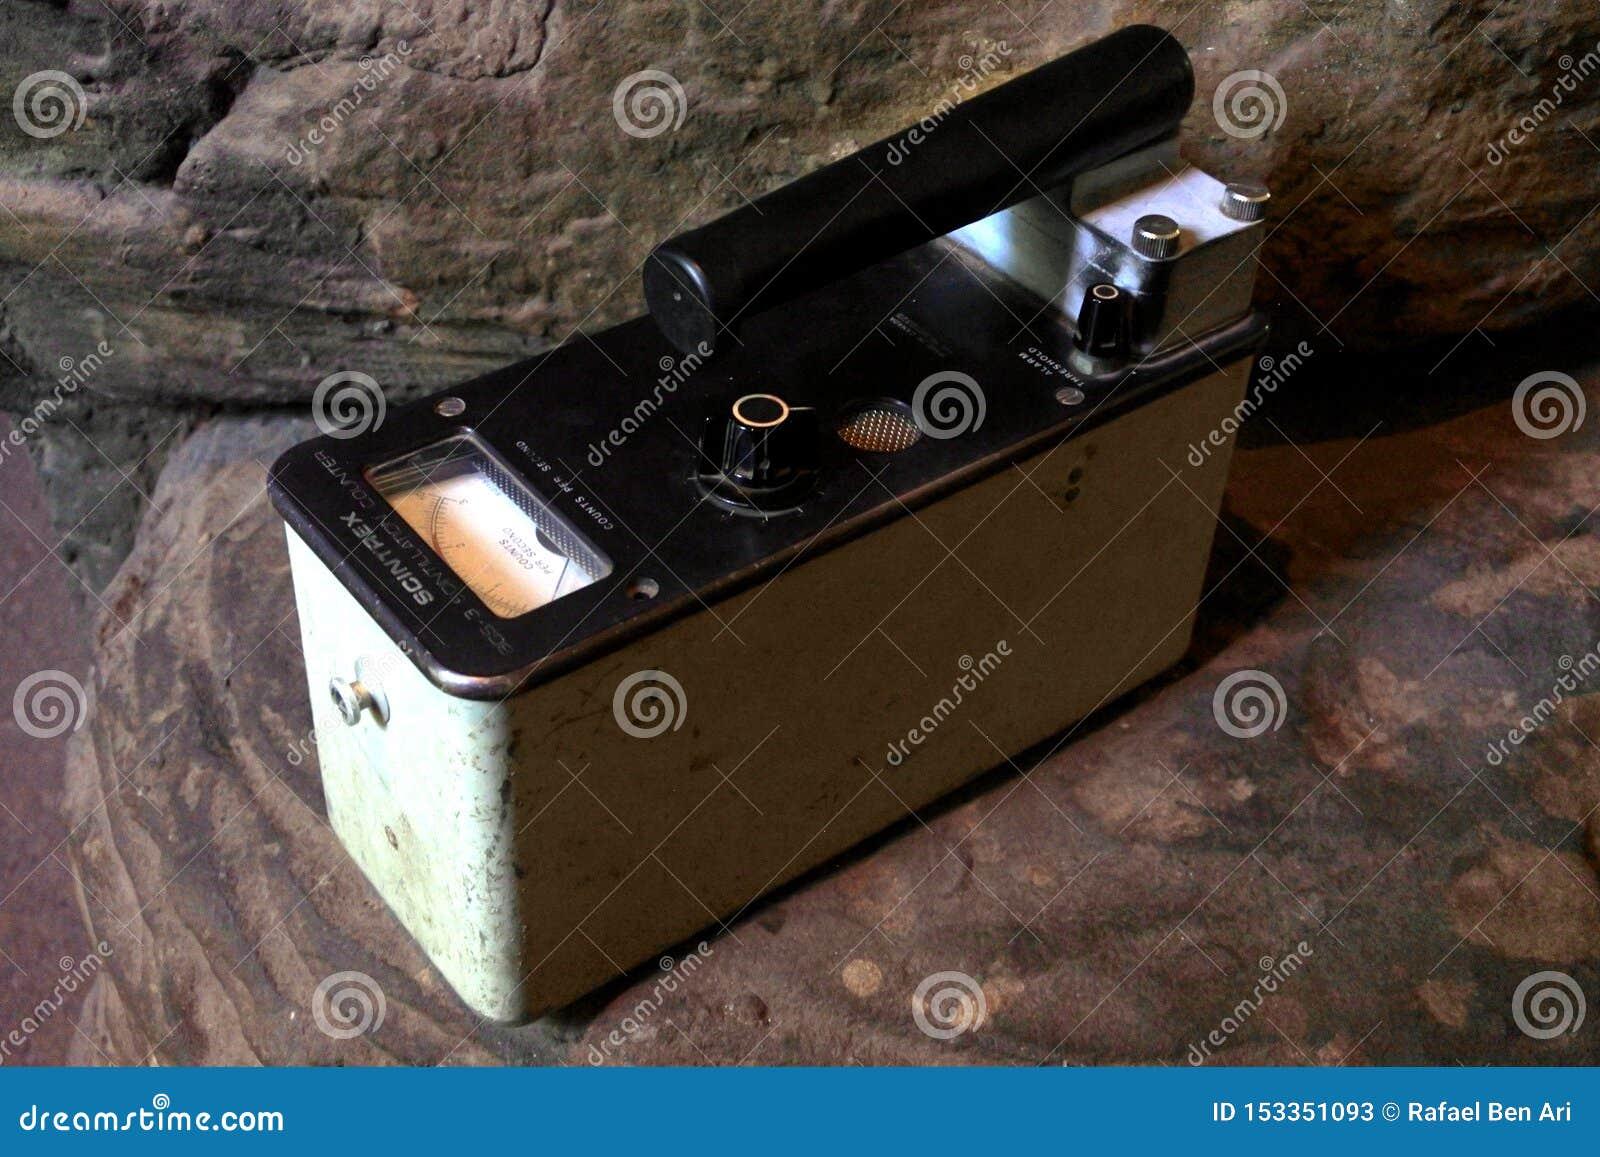 Geiger counter radiation detection instrument